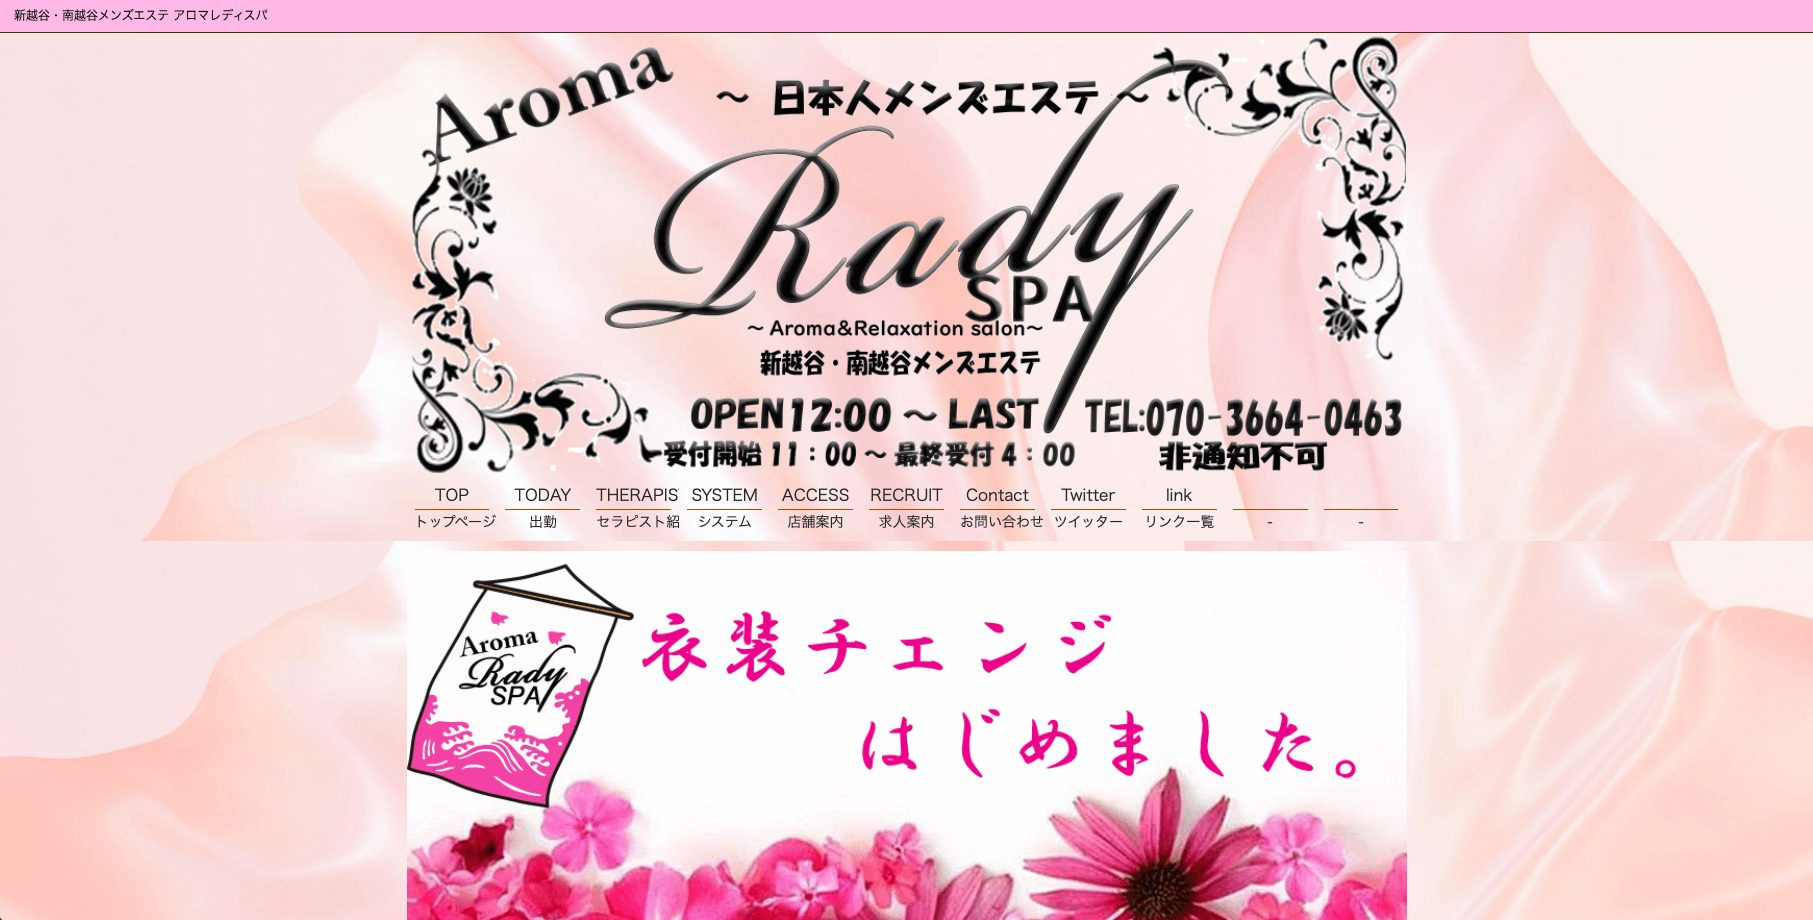 Aroma Rady SPA(アロマレディースパ)